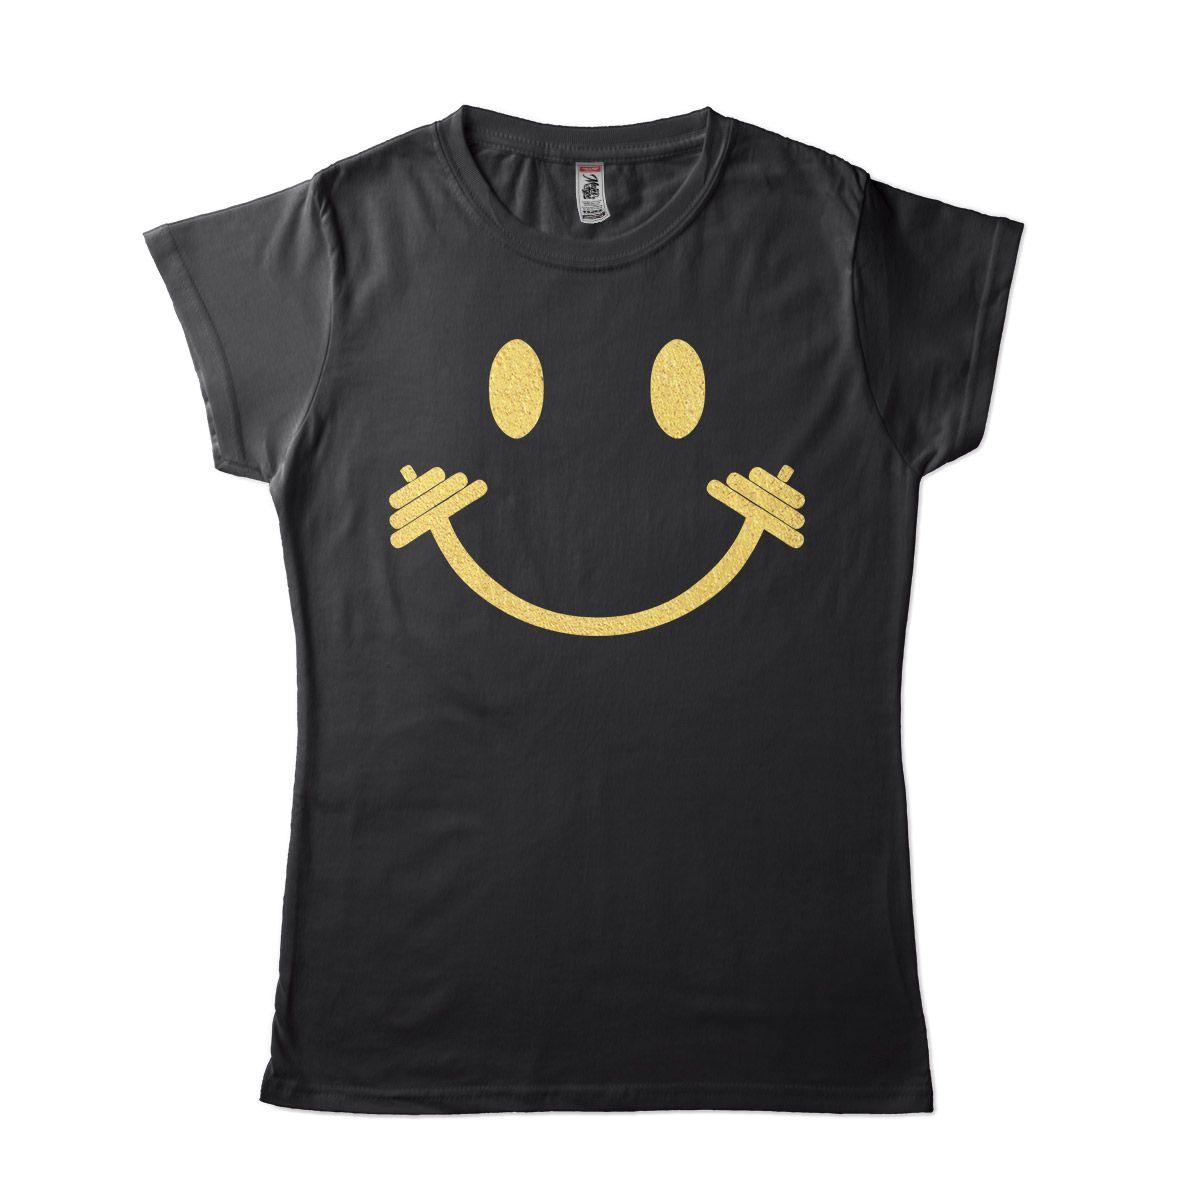 Camisetas Para Academia Feminina Musculacao Smile Loja Da Camisa